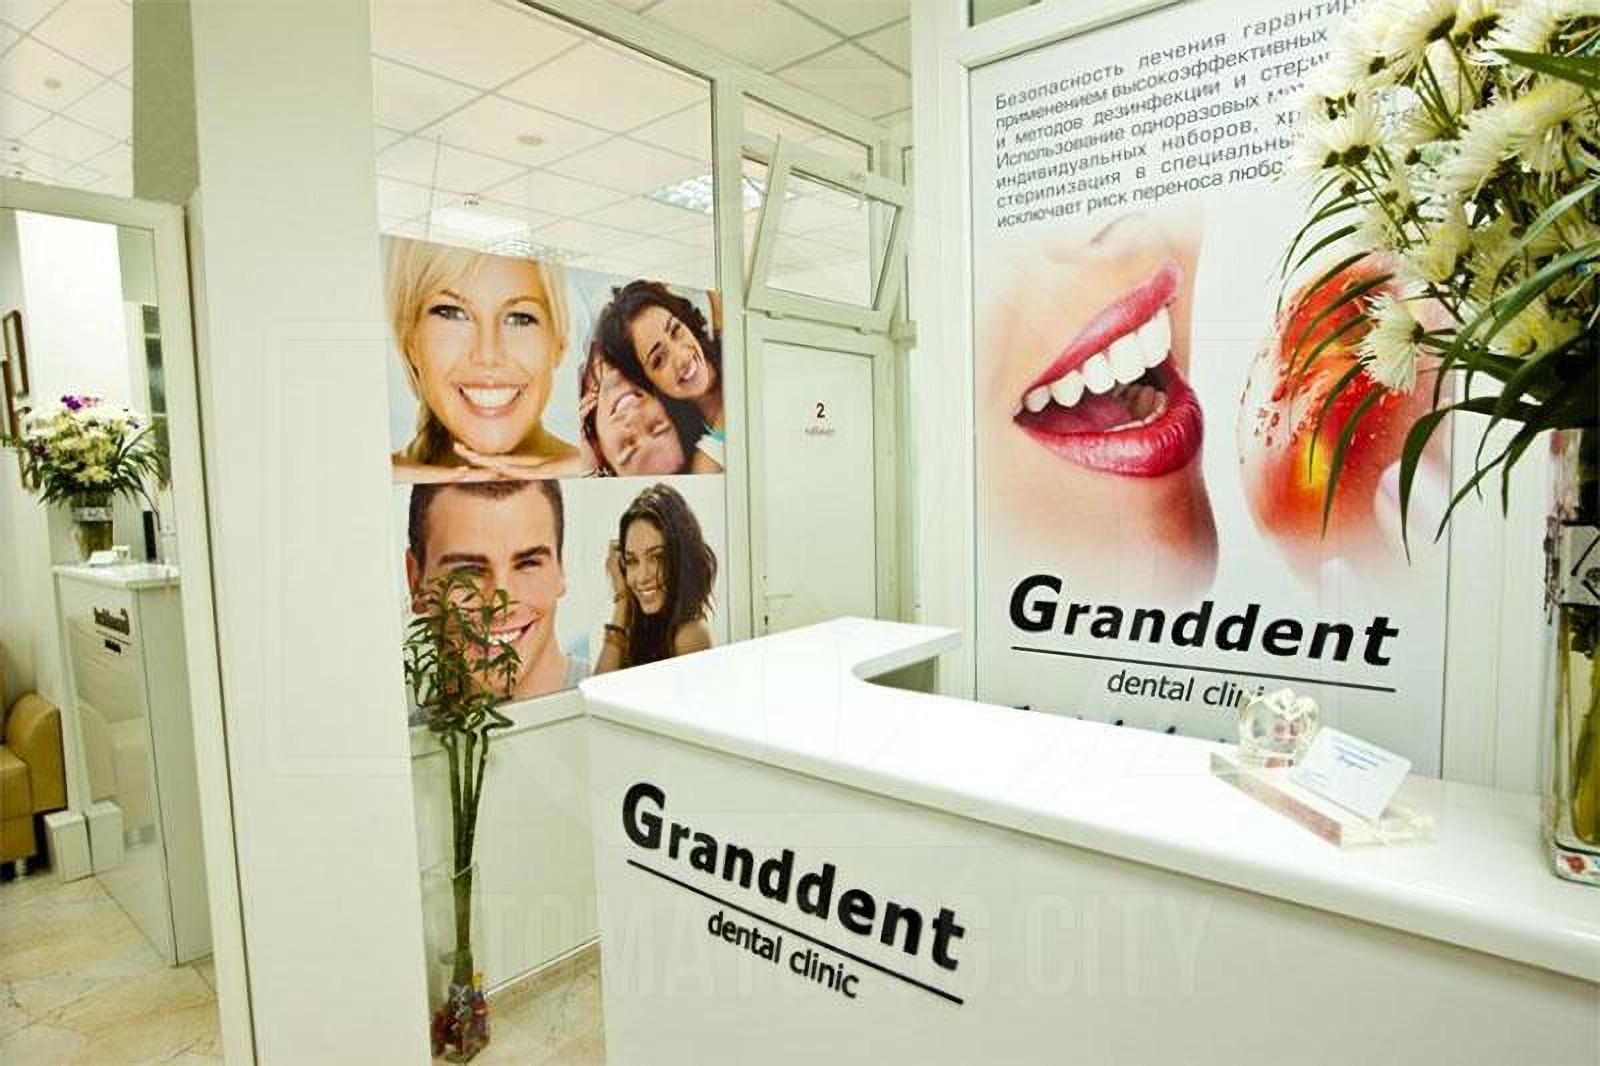 Receptionist administrator in the dental clinic Granddent in Odessa Ukraine